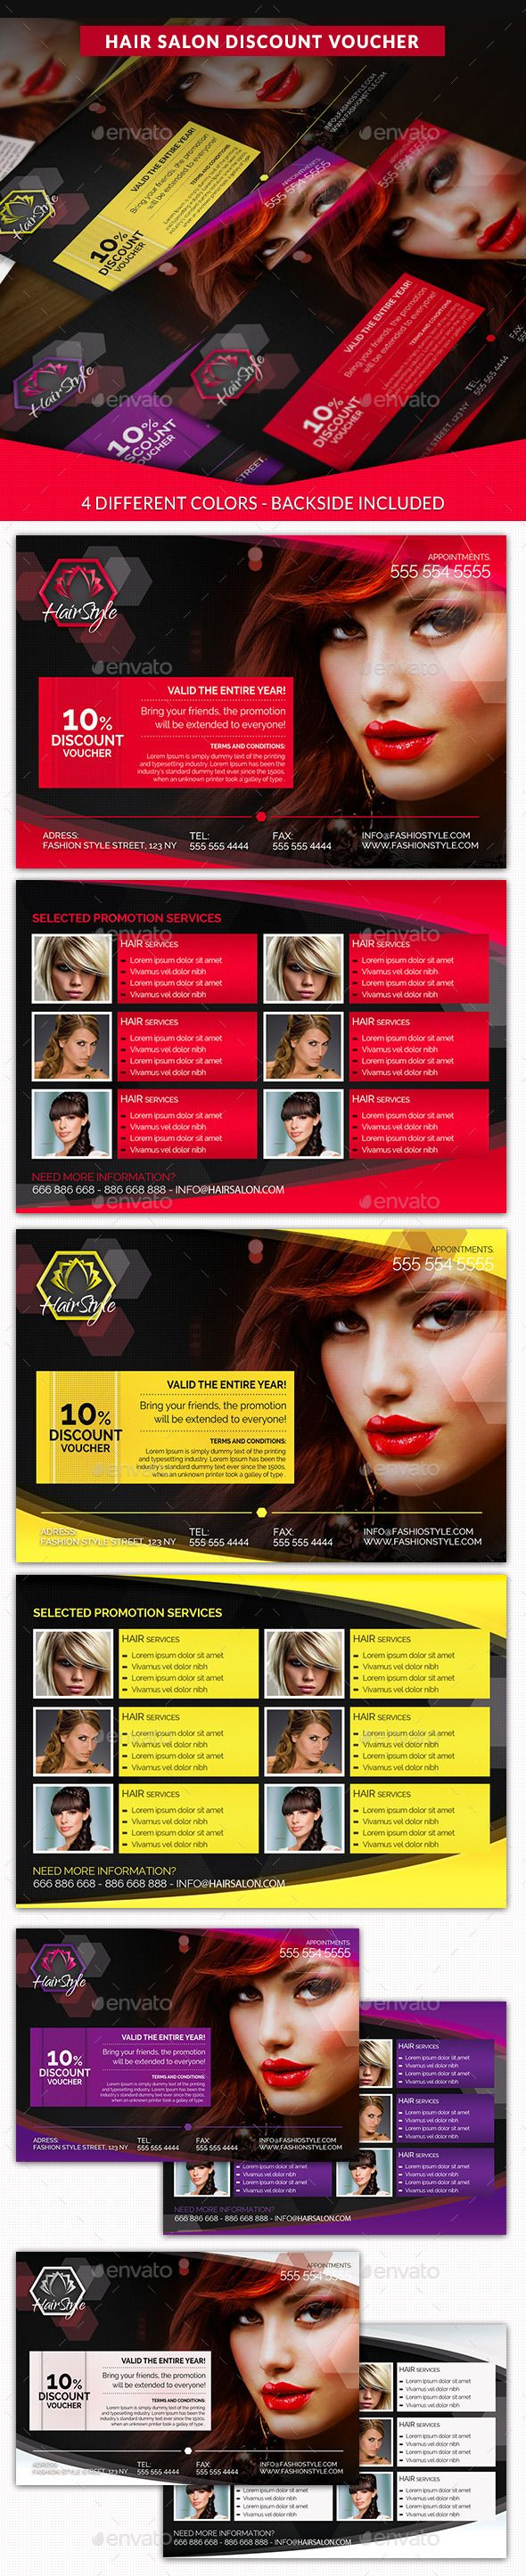 Hair Salon Fashion Style Discount Voucher